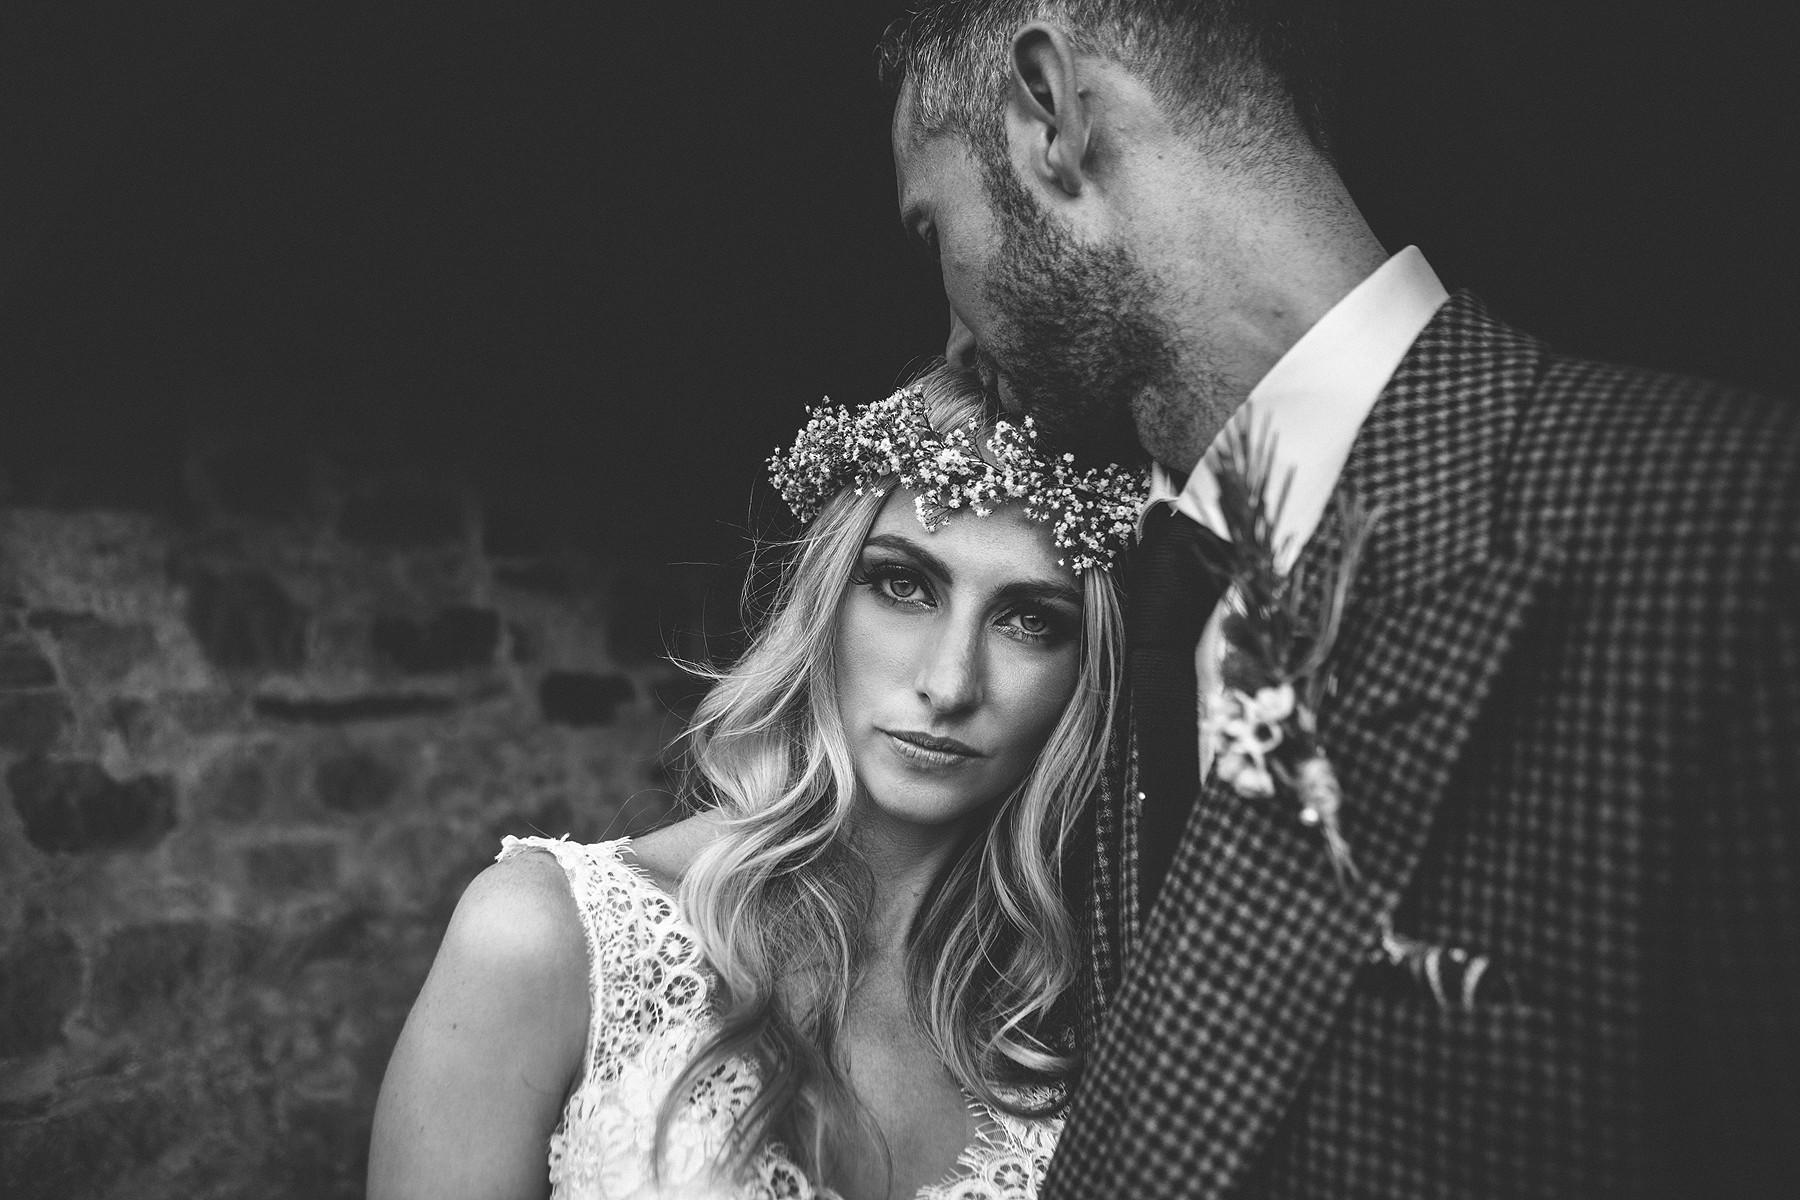 healey_barn_wedding_photography1-1800x1200.jpg